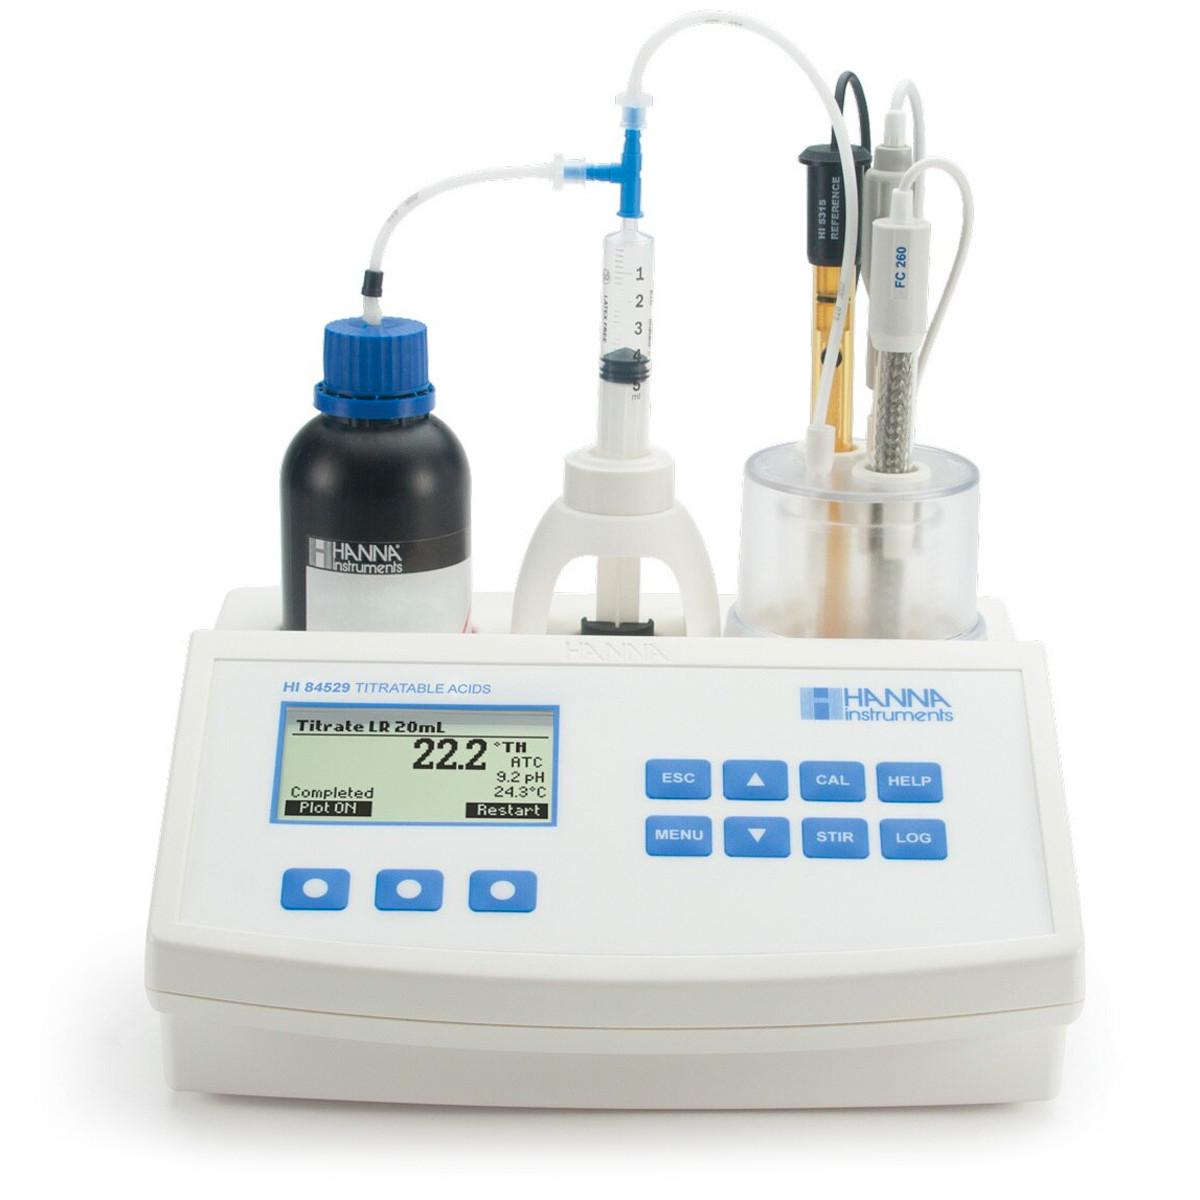 Mini Titrator for Measuring Titratable Acidity